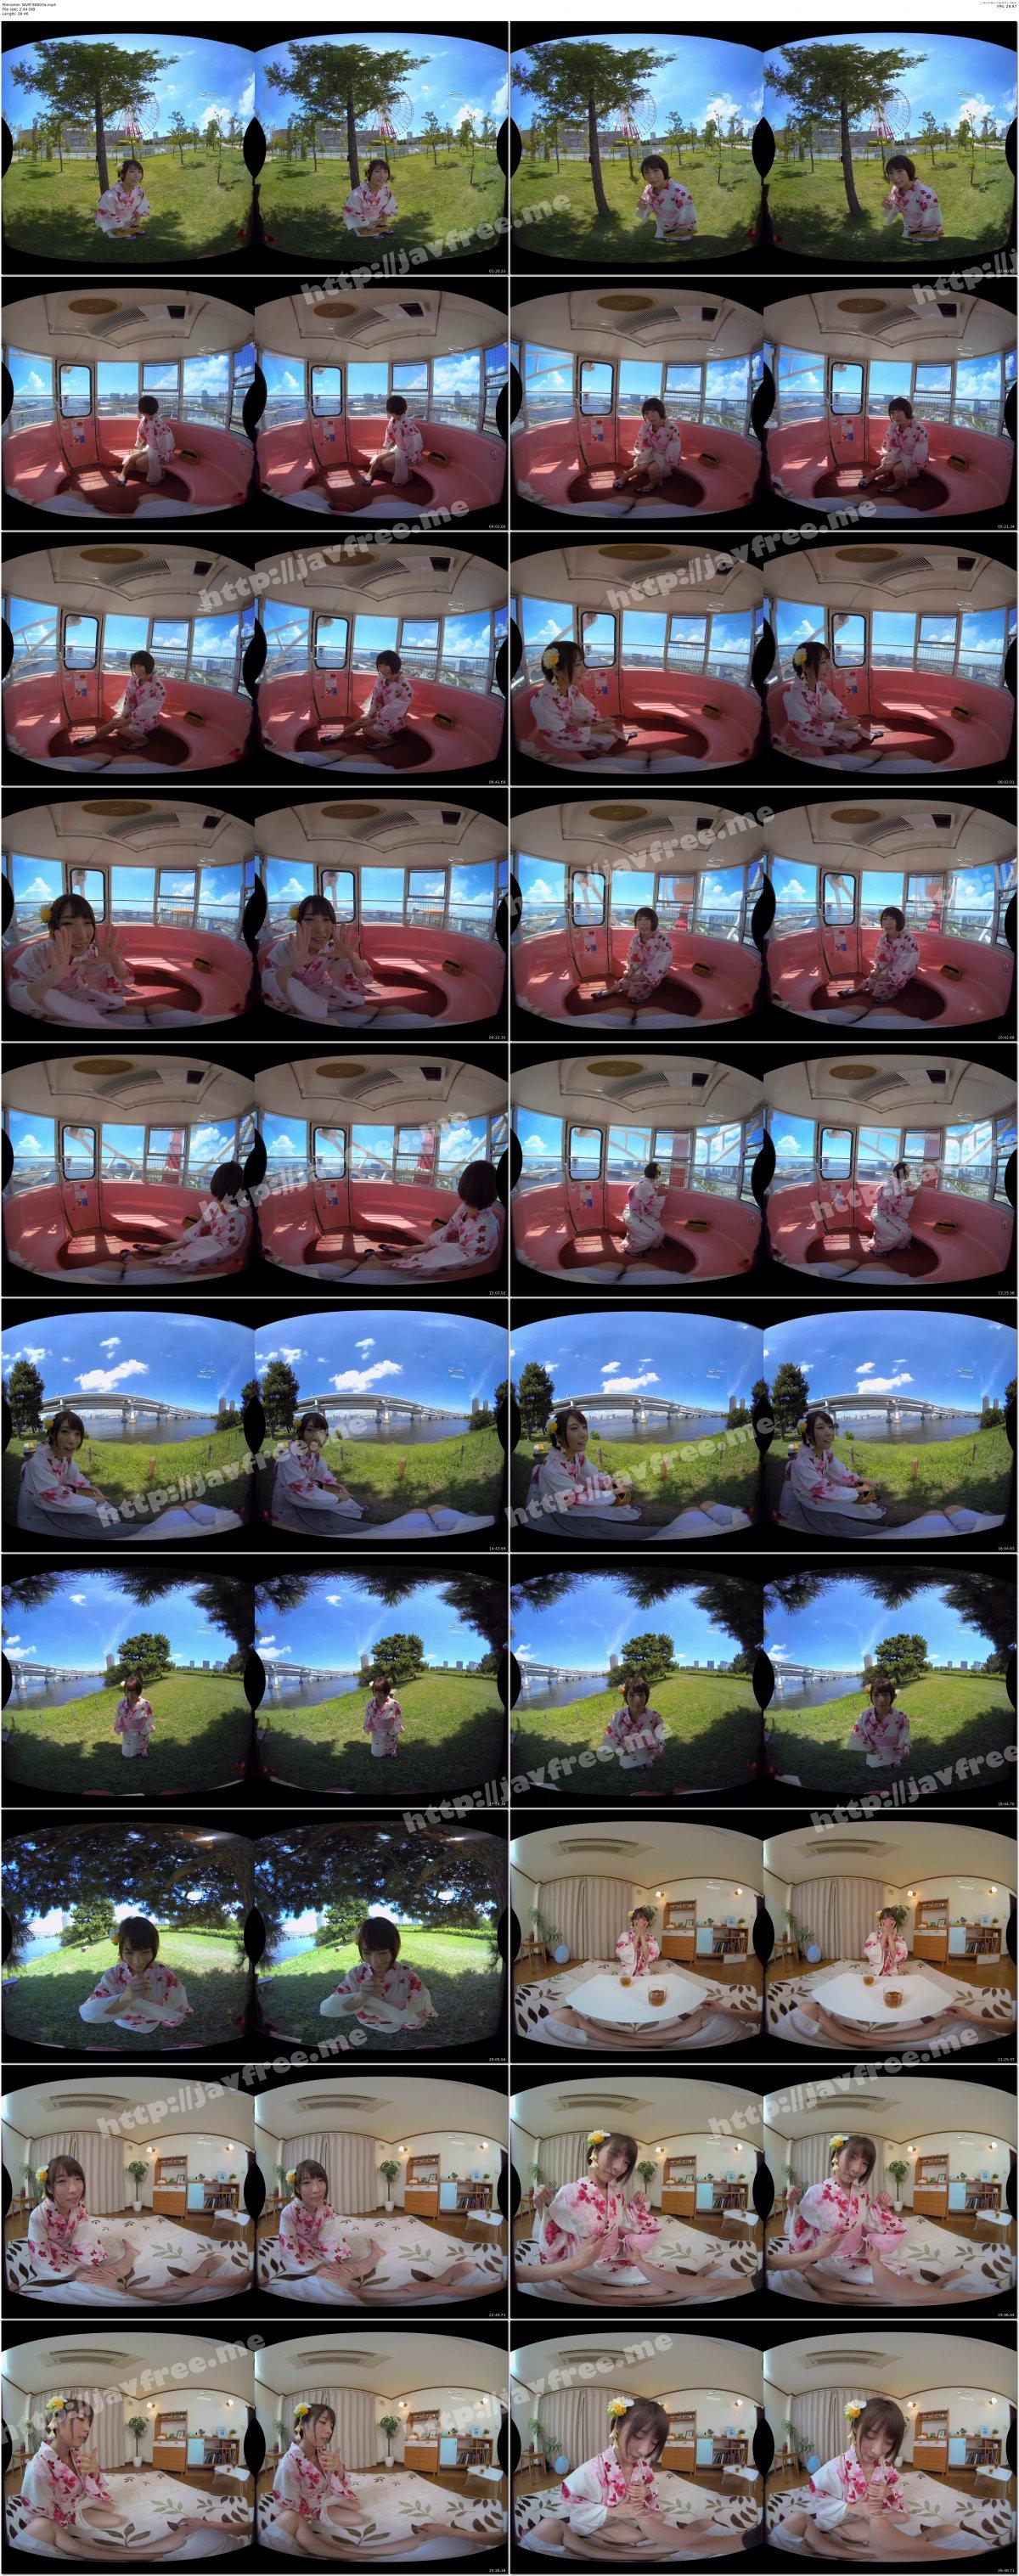 [WVR-90003] 【VR】VR メチャLOVE ドキドキ初デート阿部乃みく 密着大好き!絶対に離さないからね!! - image WVR-90003a on https://javfree.me